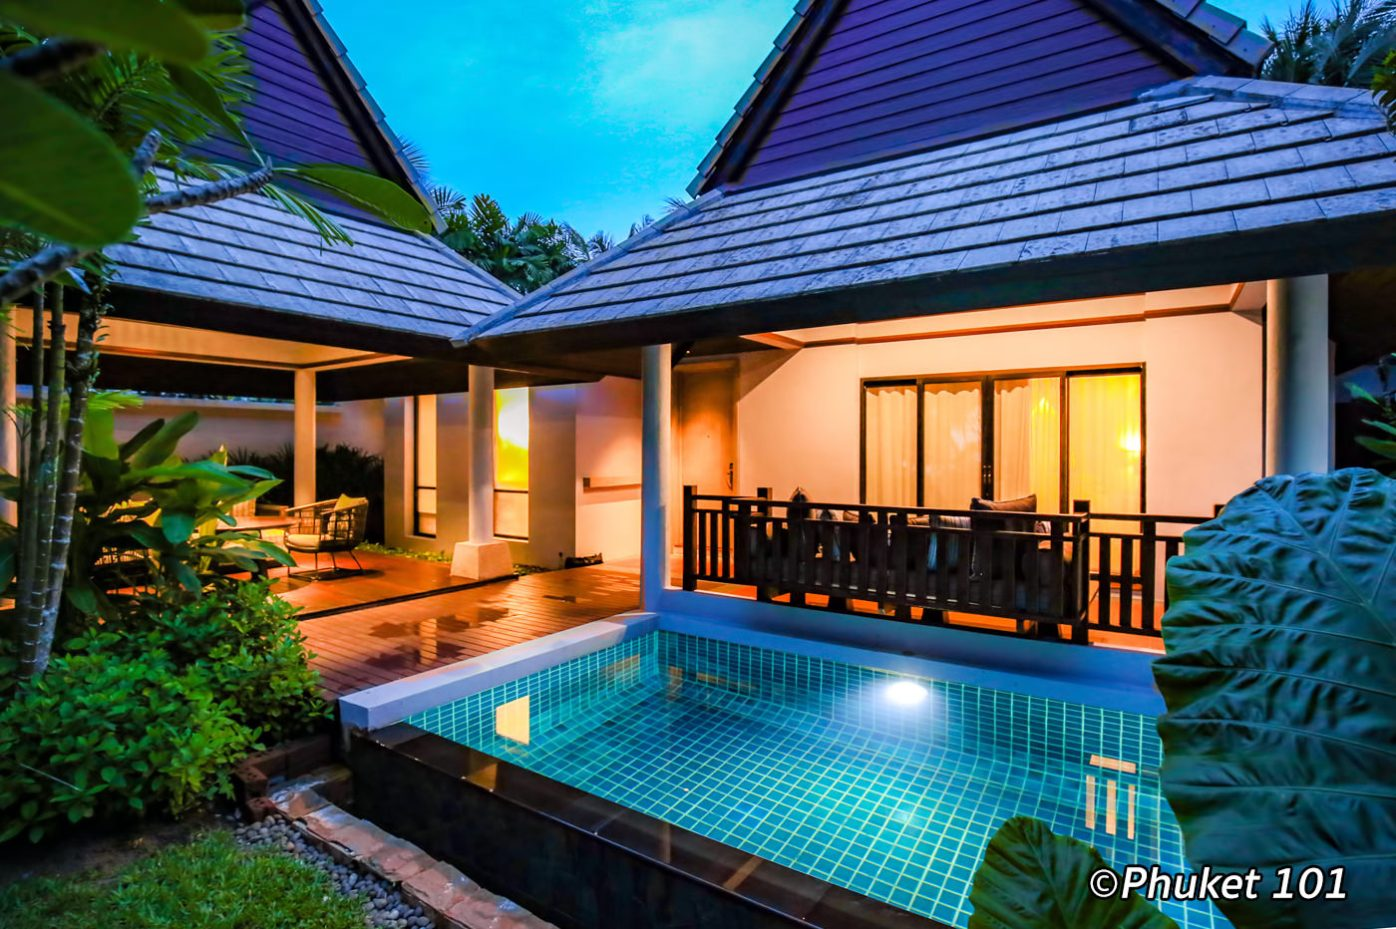 marriott-nai-yang-pool-villa